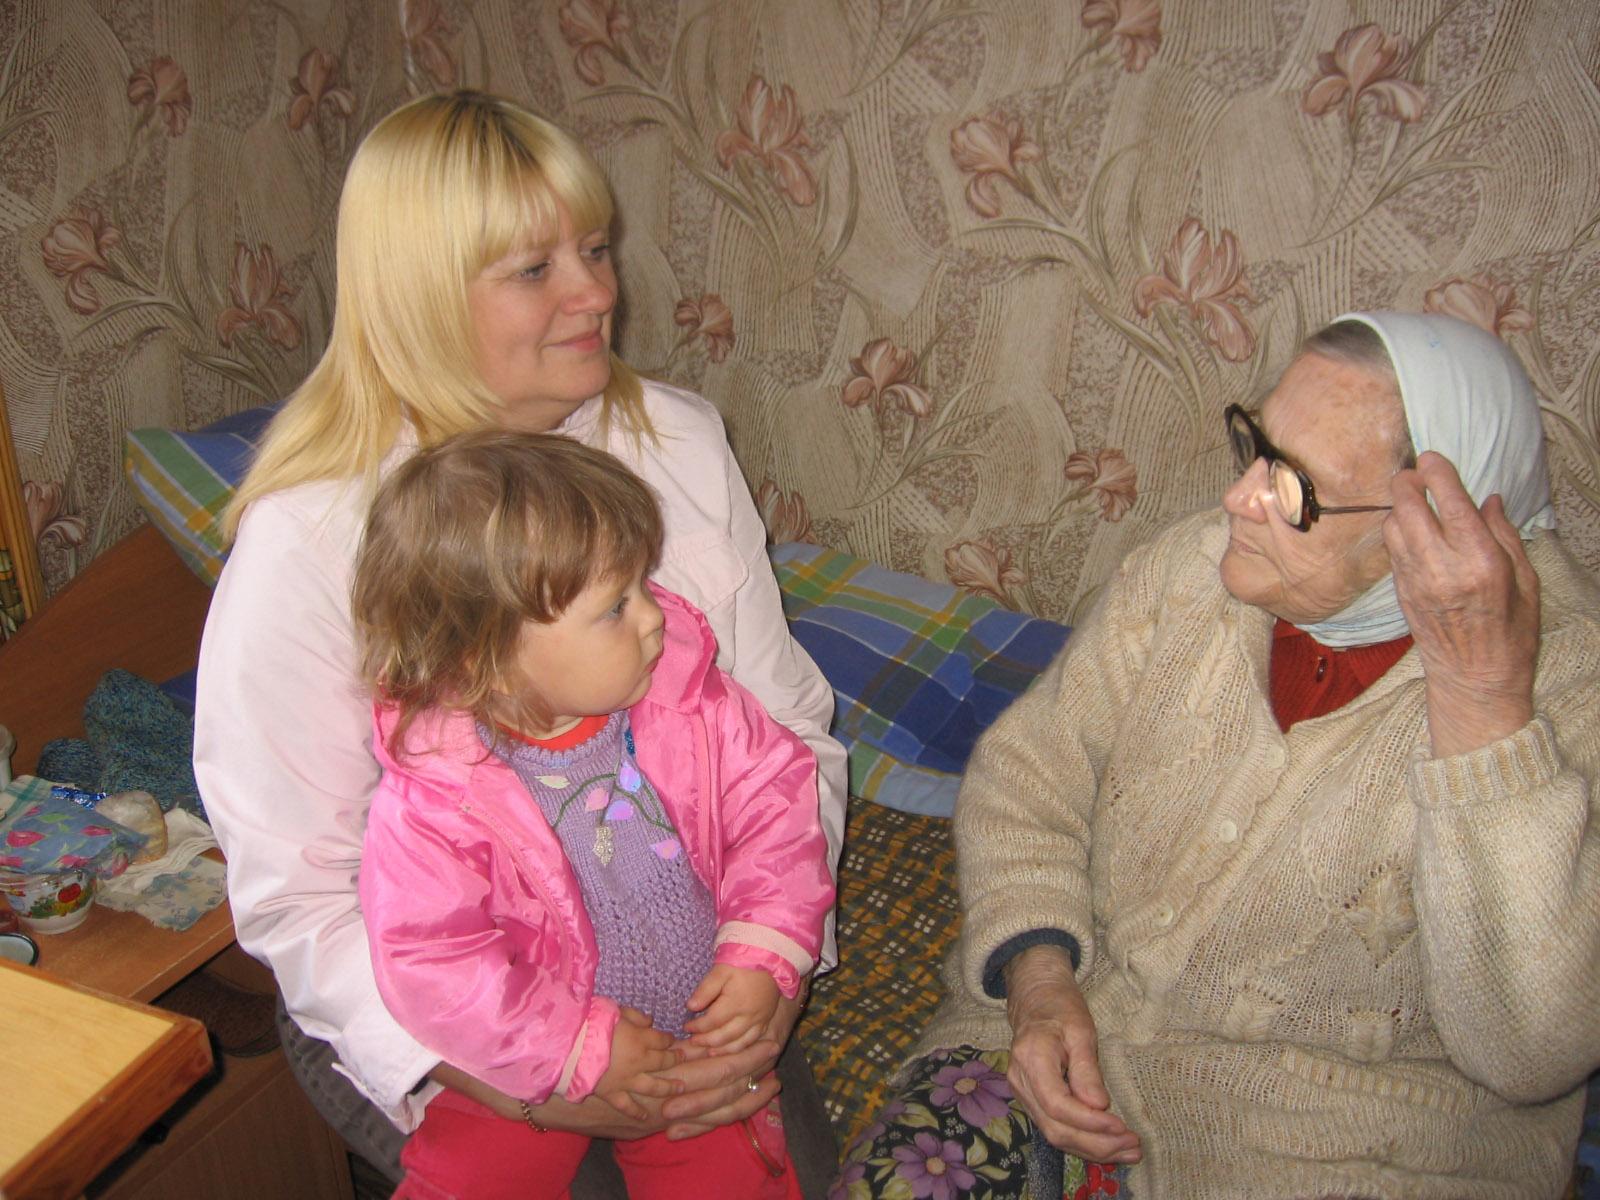 внучка и праправнучка в гостях у бабушки Ани . Стар и мал